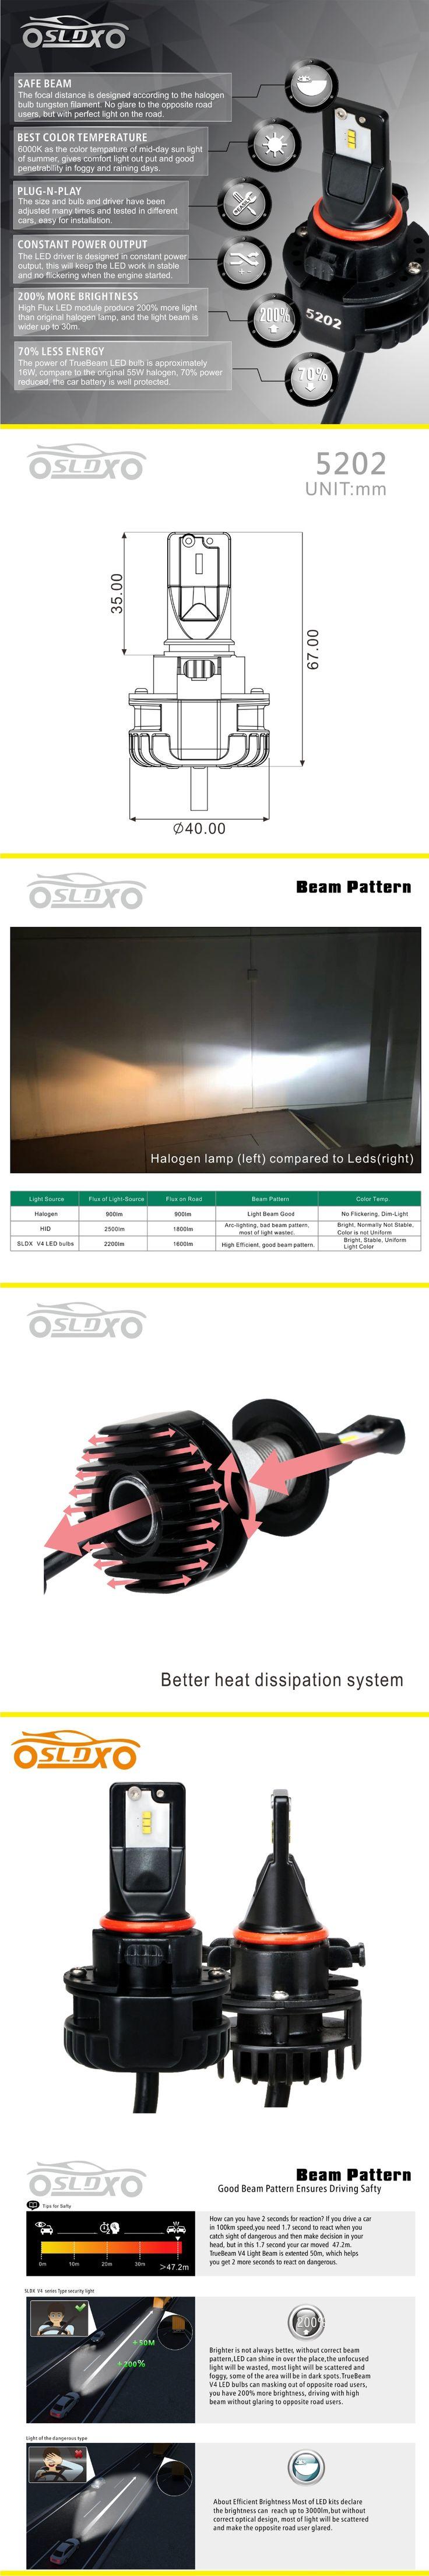 SLDX 2pcs 5202  Led  Car HeadLight  5000K 12V 24W Led Auto Bulb  Replace HID Halogen Bulb -2 Years Warranty